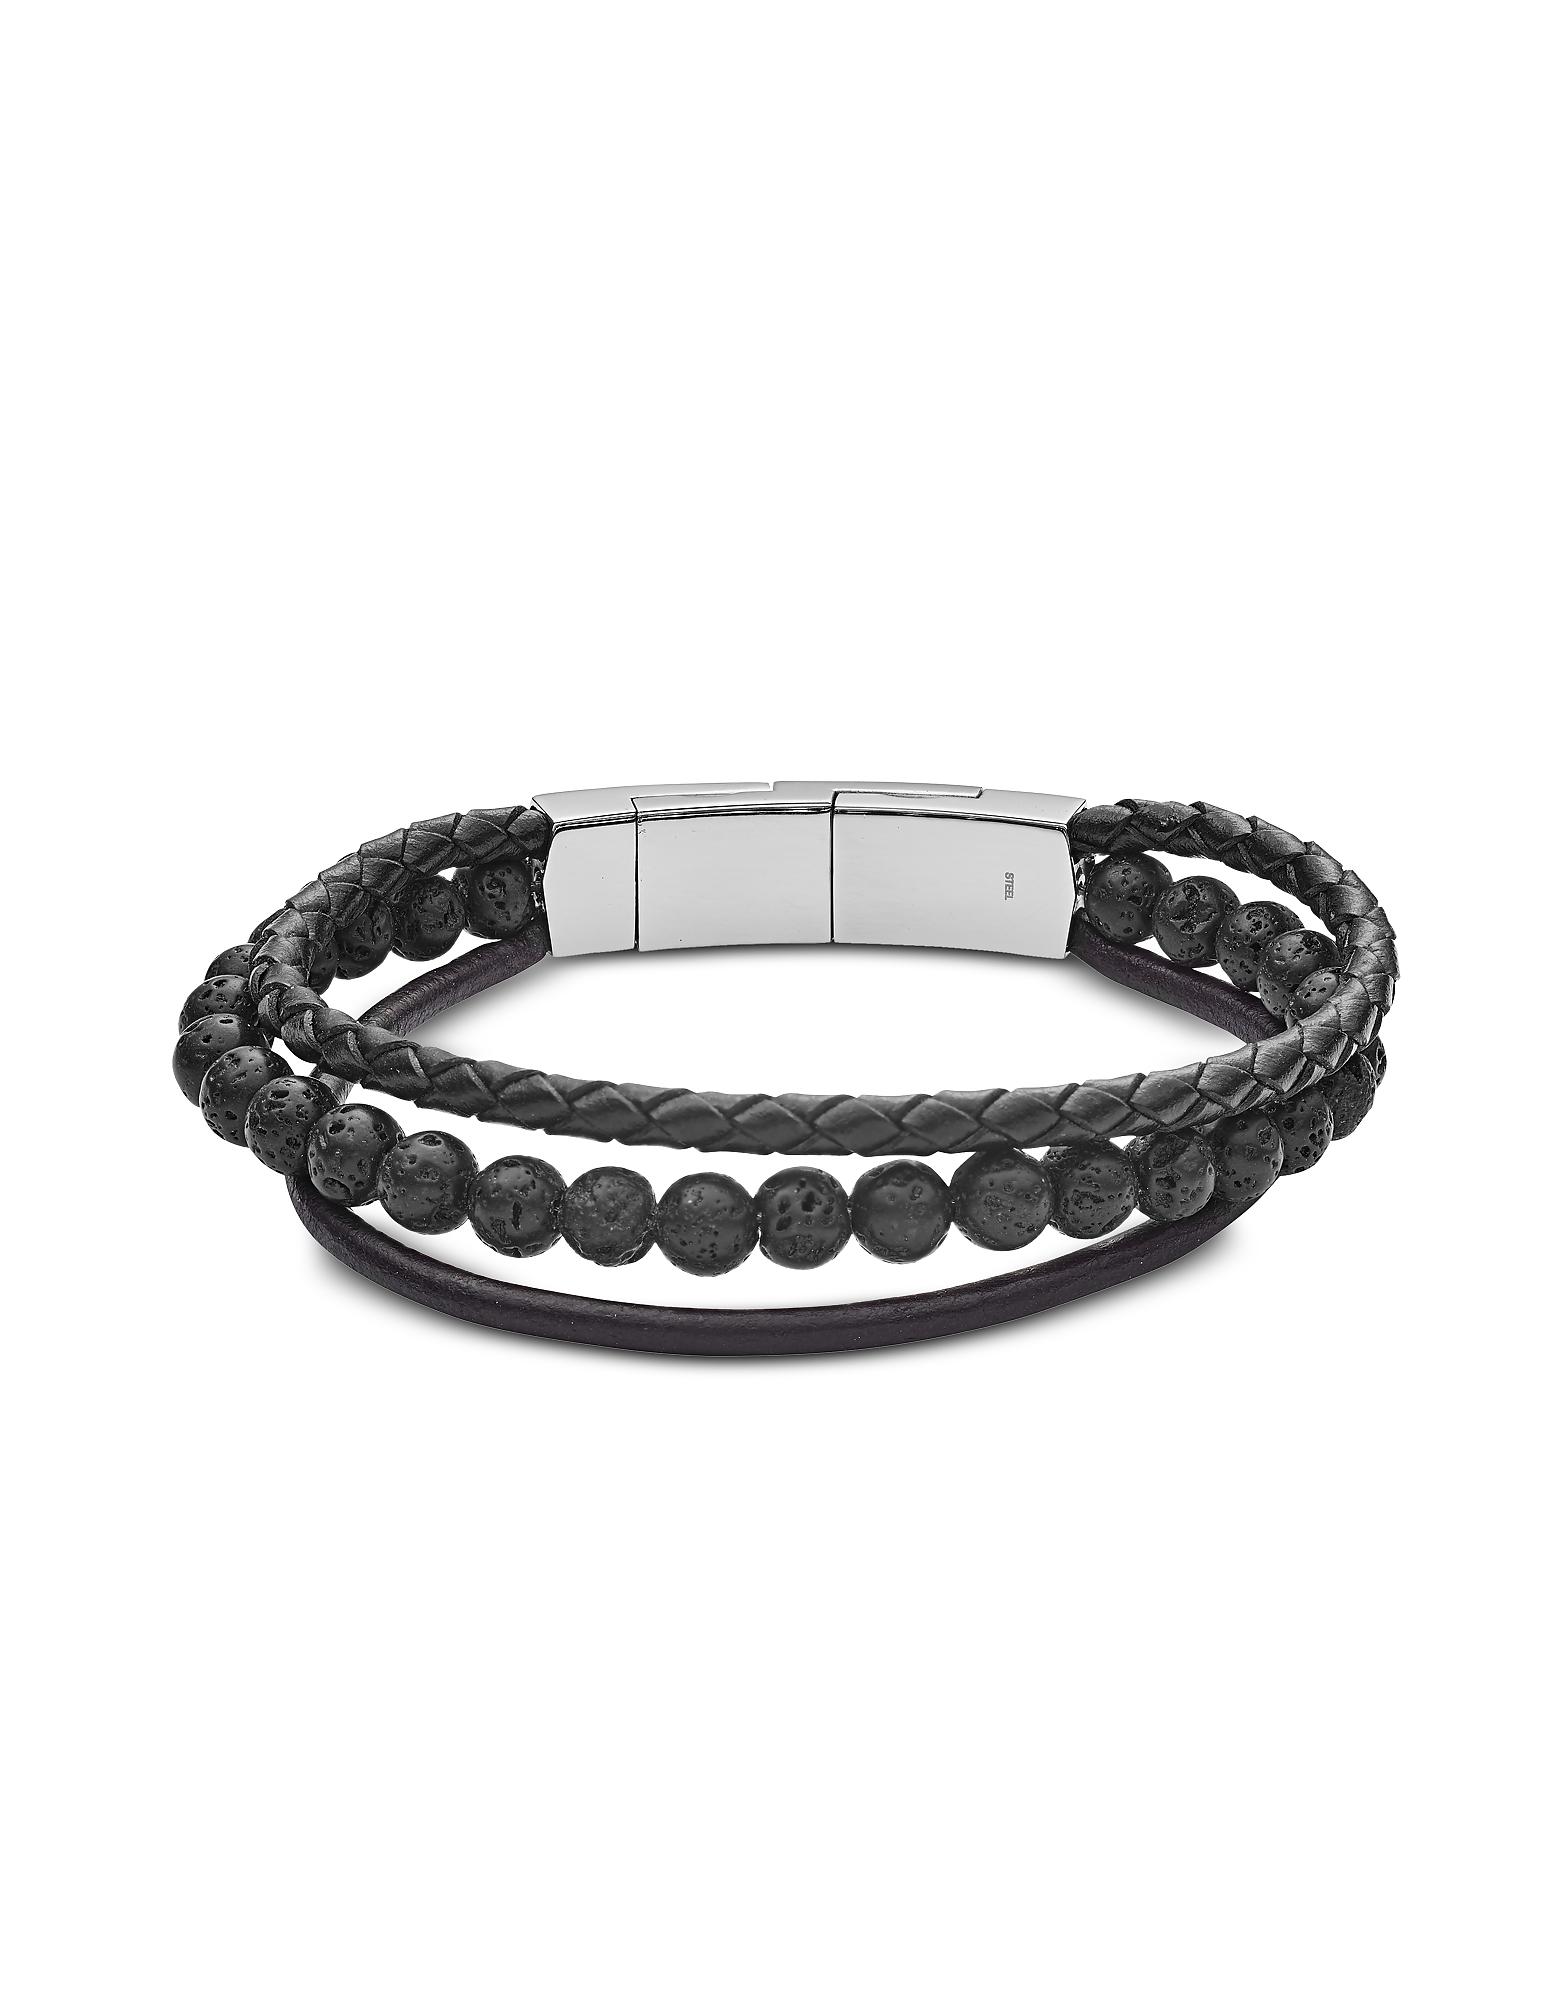 Fossil Men's Bracelets, Vintage Casual Multi-Strand Leather and Lava Beads Men's Bracelet